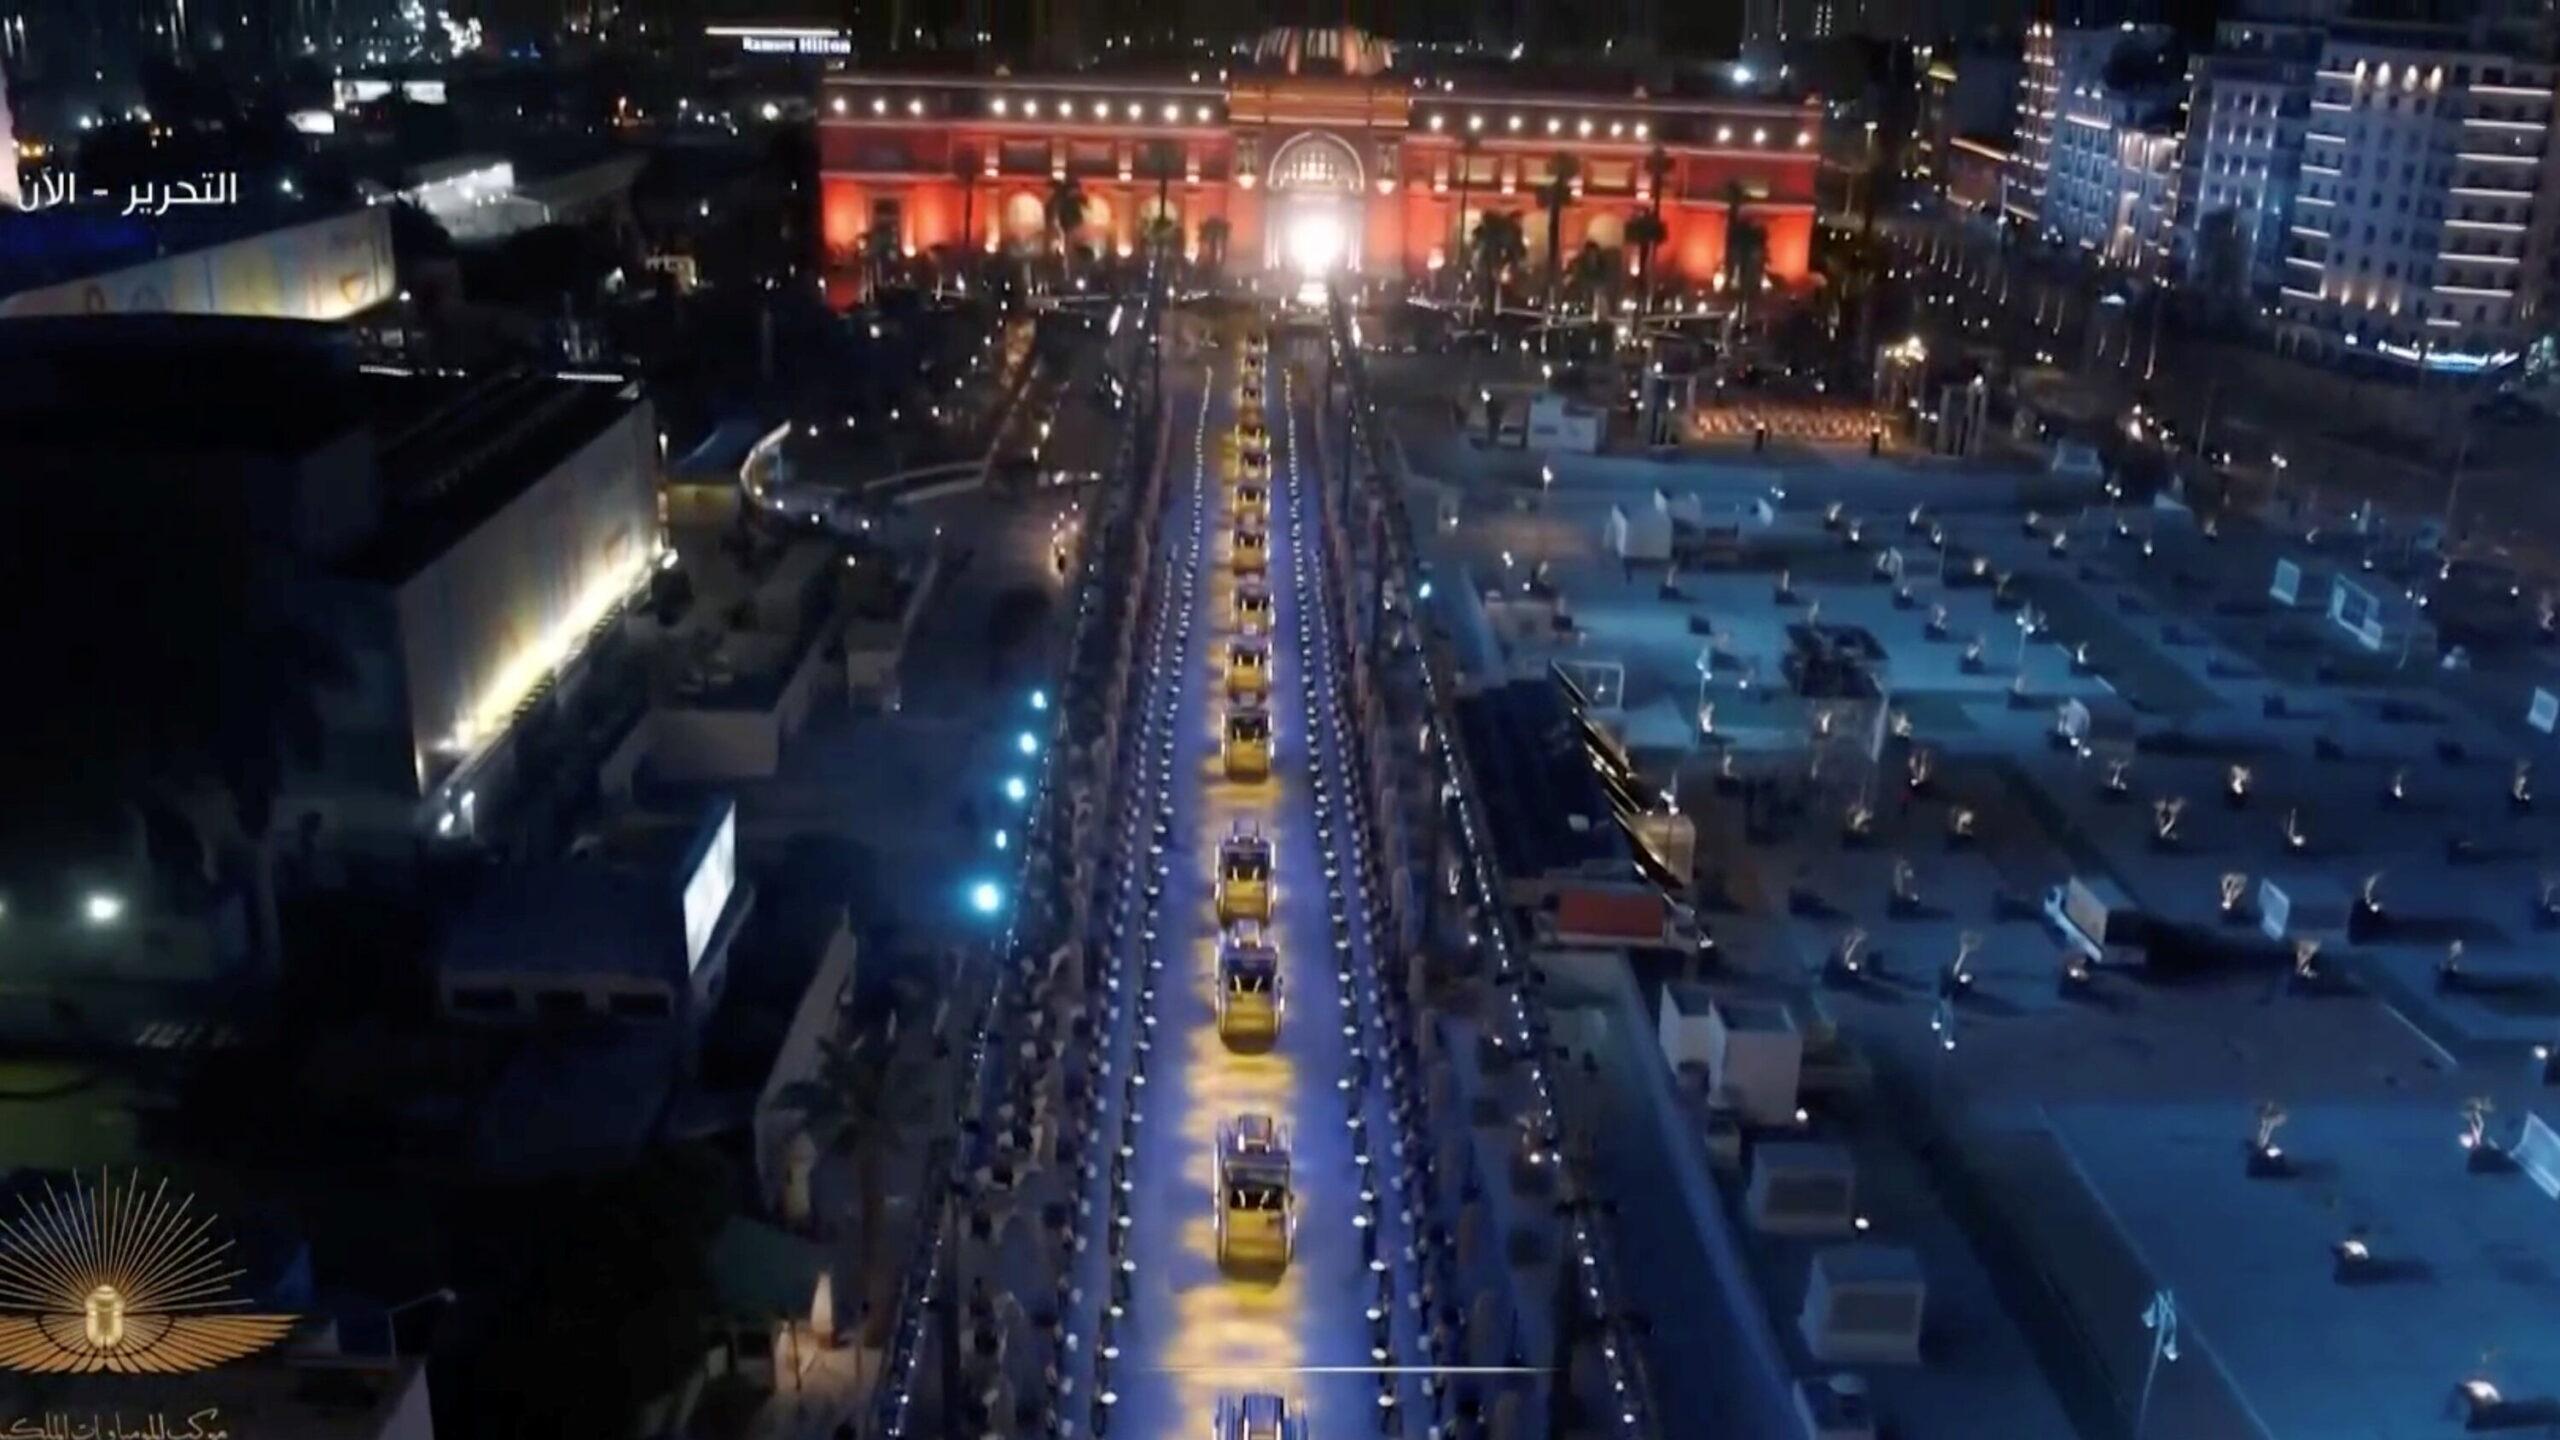 Egypt's Pharaohs Golden Parade: Proud to be Egyptian